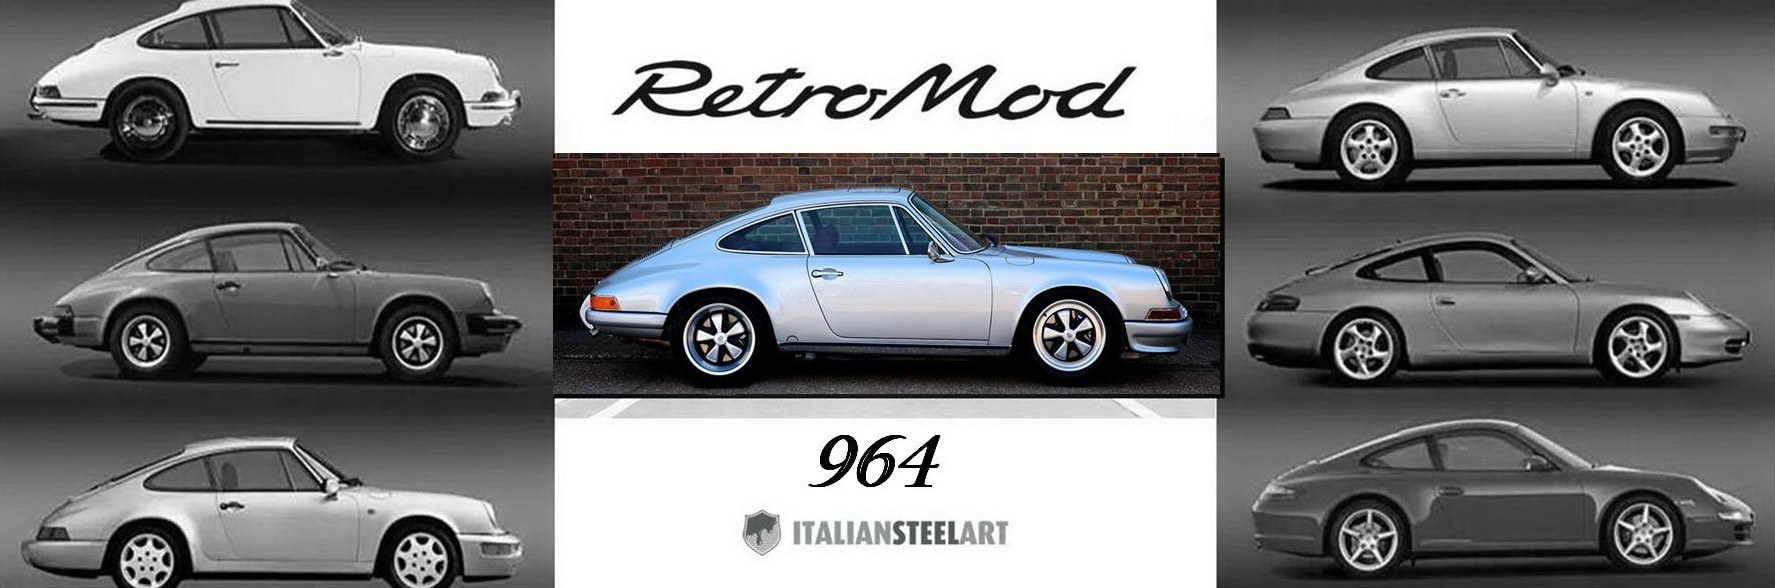 964 retromod banner 12